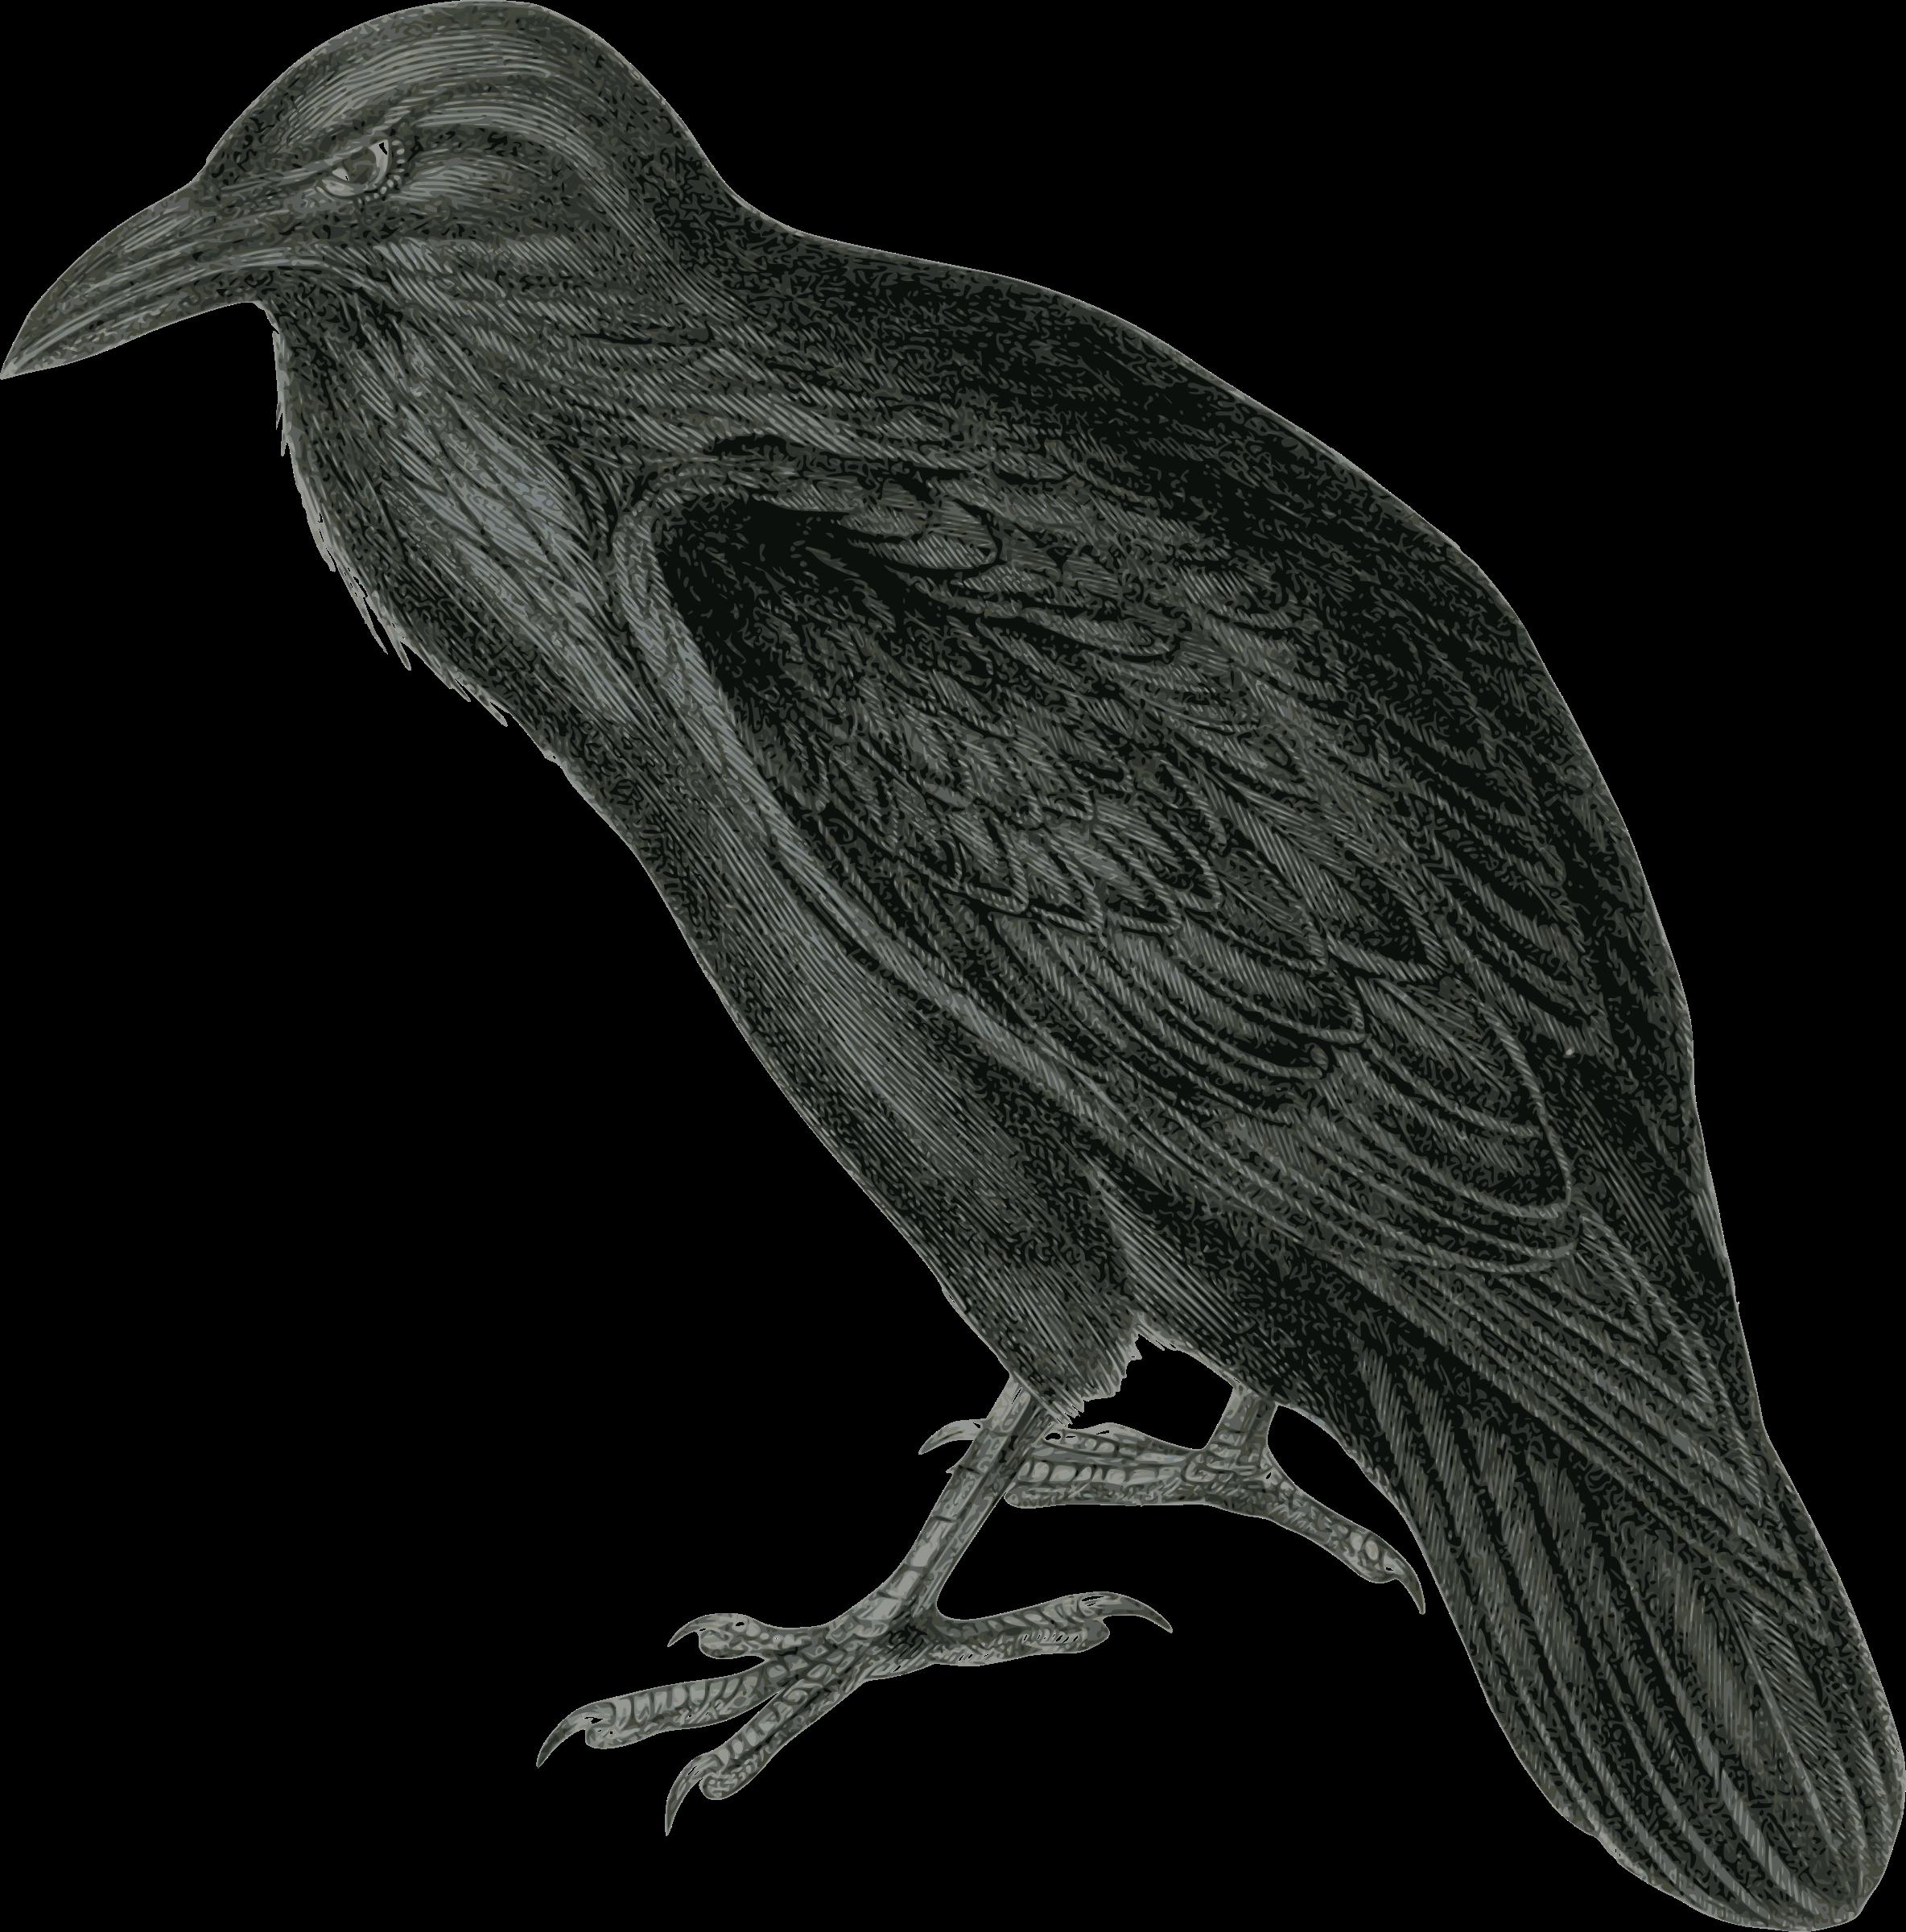 Raven Vector Clipart image - Free stock photo - Public ...